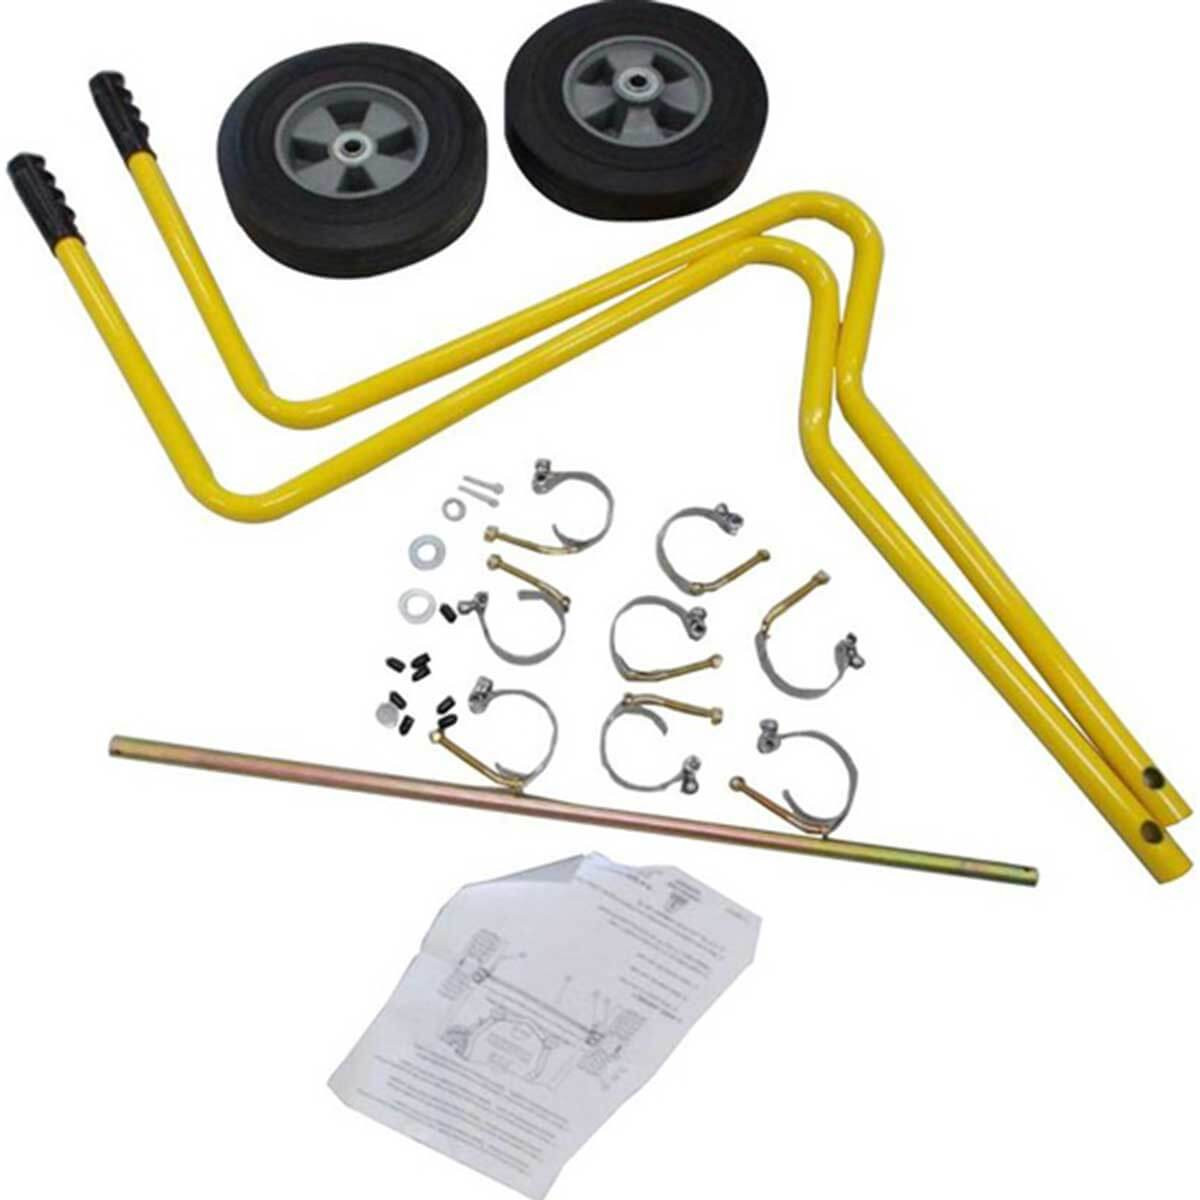 Wacker Wheel Transportation Kit for 3 inch Trash Pump